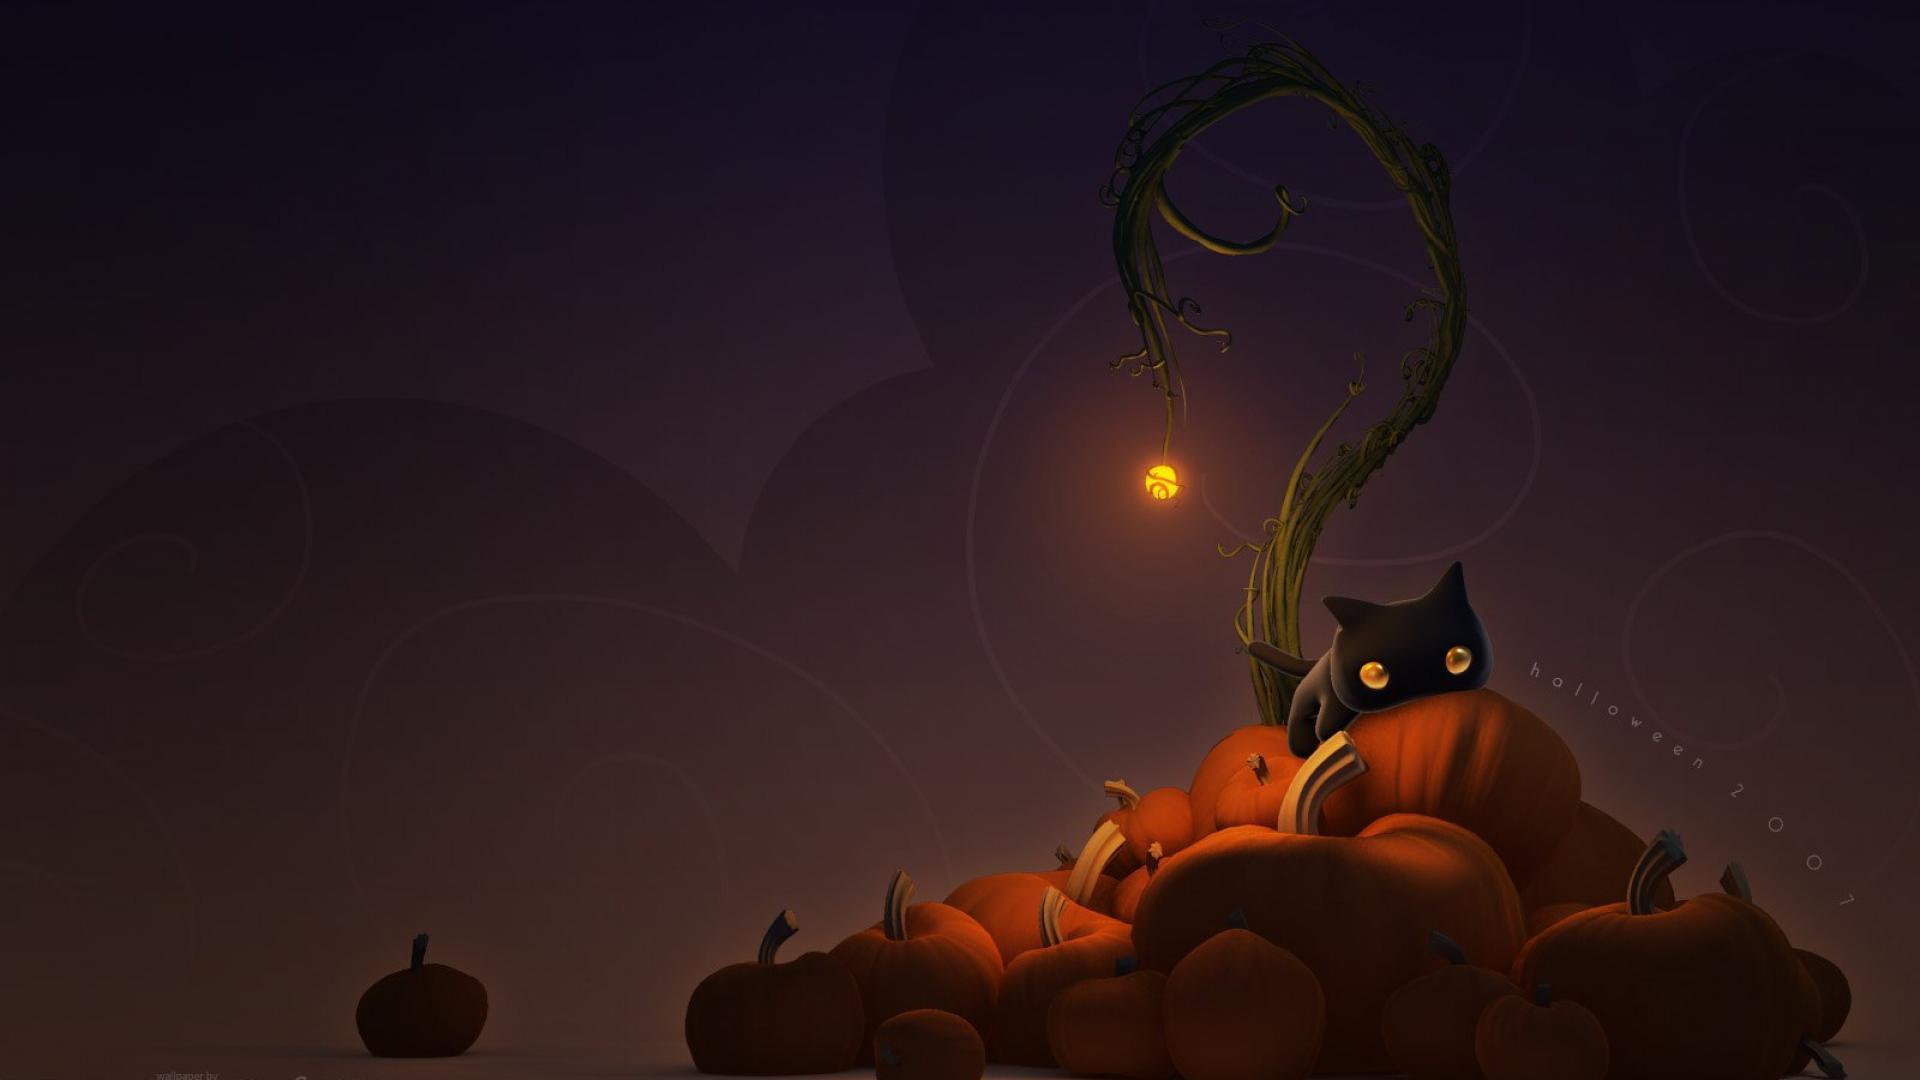 Black-Cat-Pumpkin-Halloween-wallpaper-wp3603395